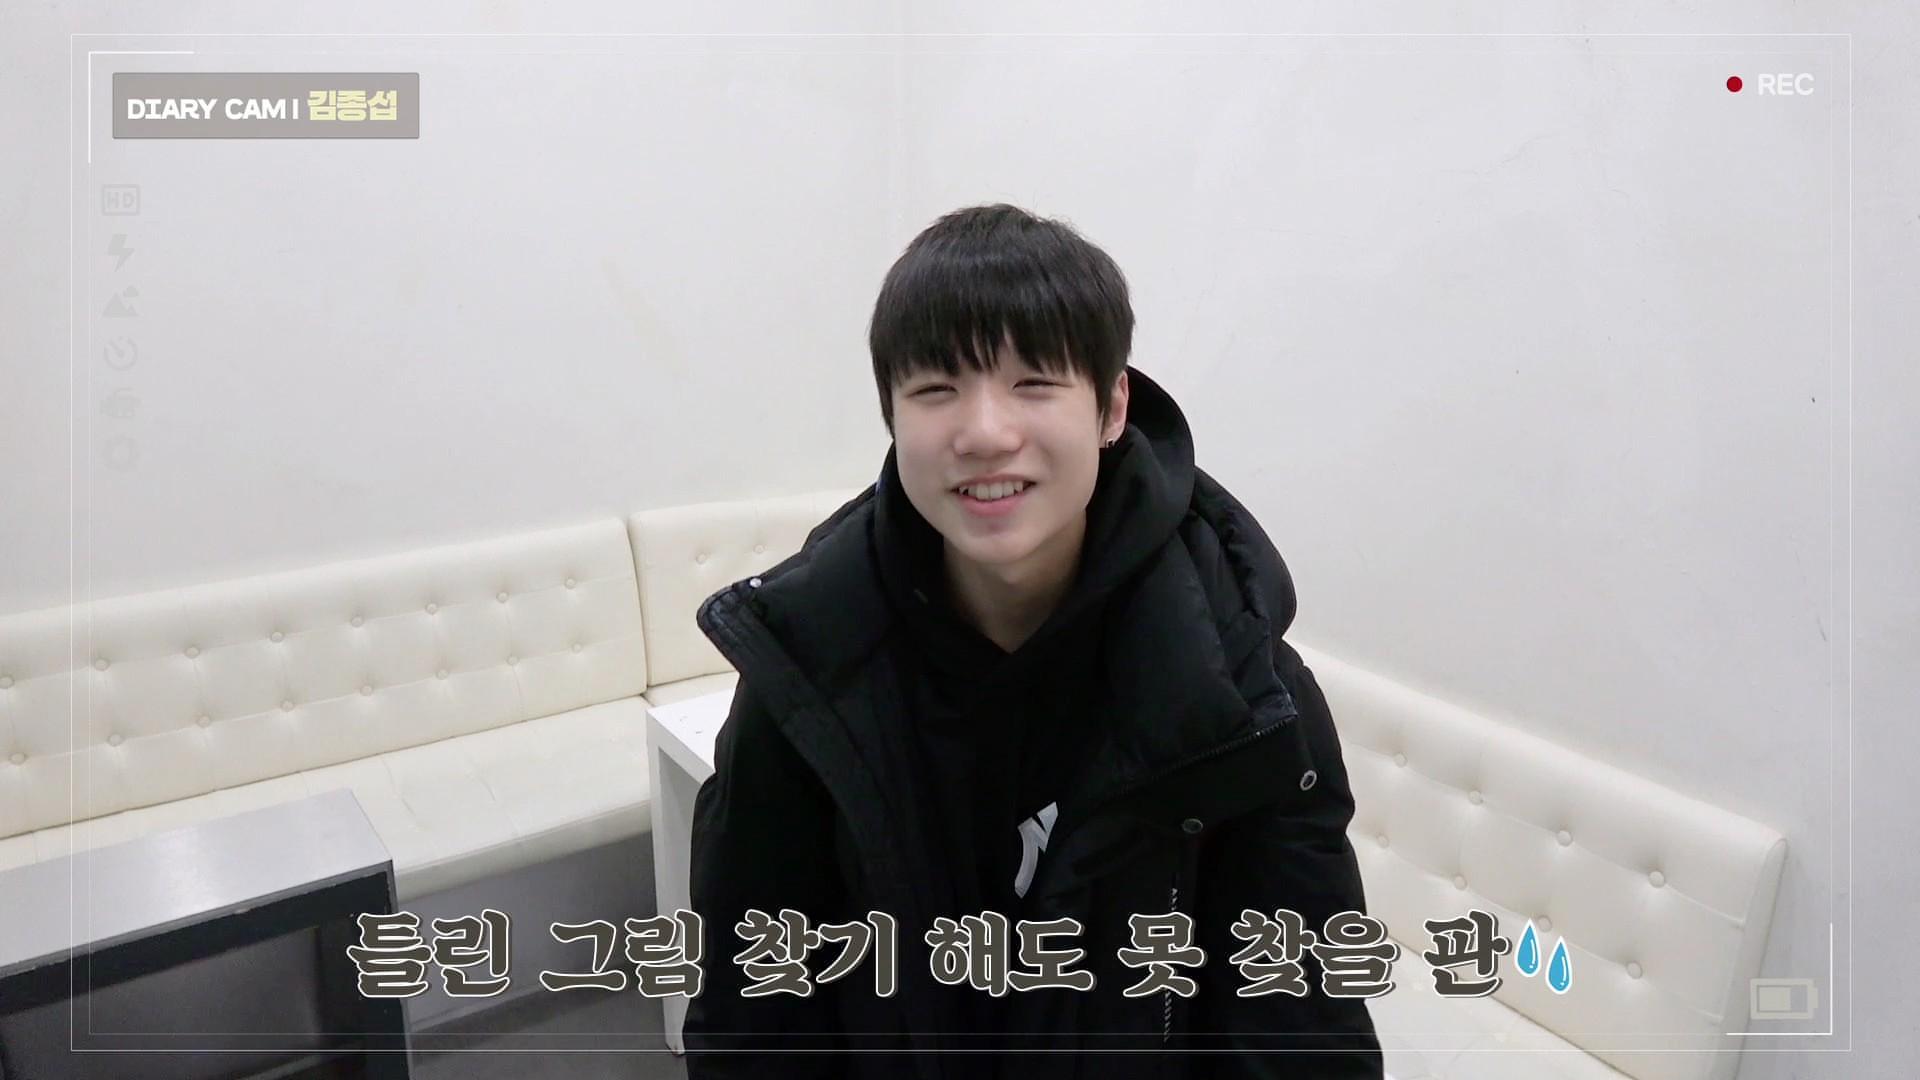 [DIARY CAM 3] 김종섭 <KIM JONGSEOB> l YG보석함